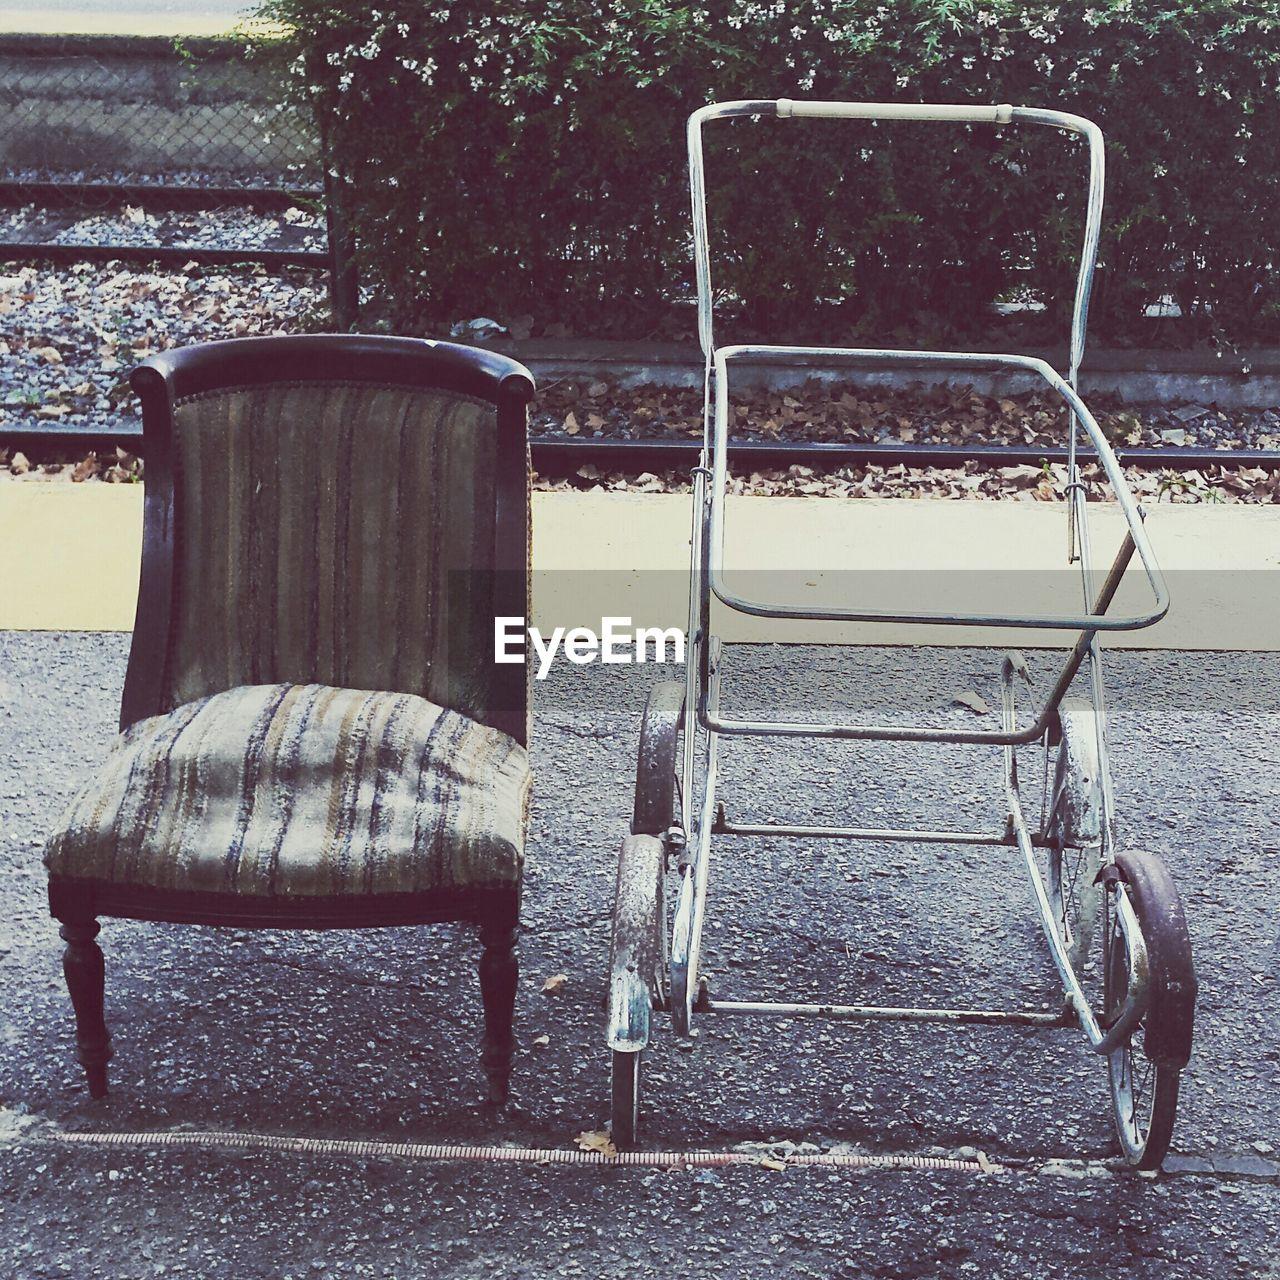 VIEW OF EMPTY SEATS